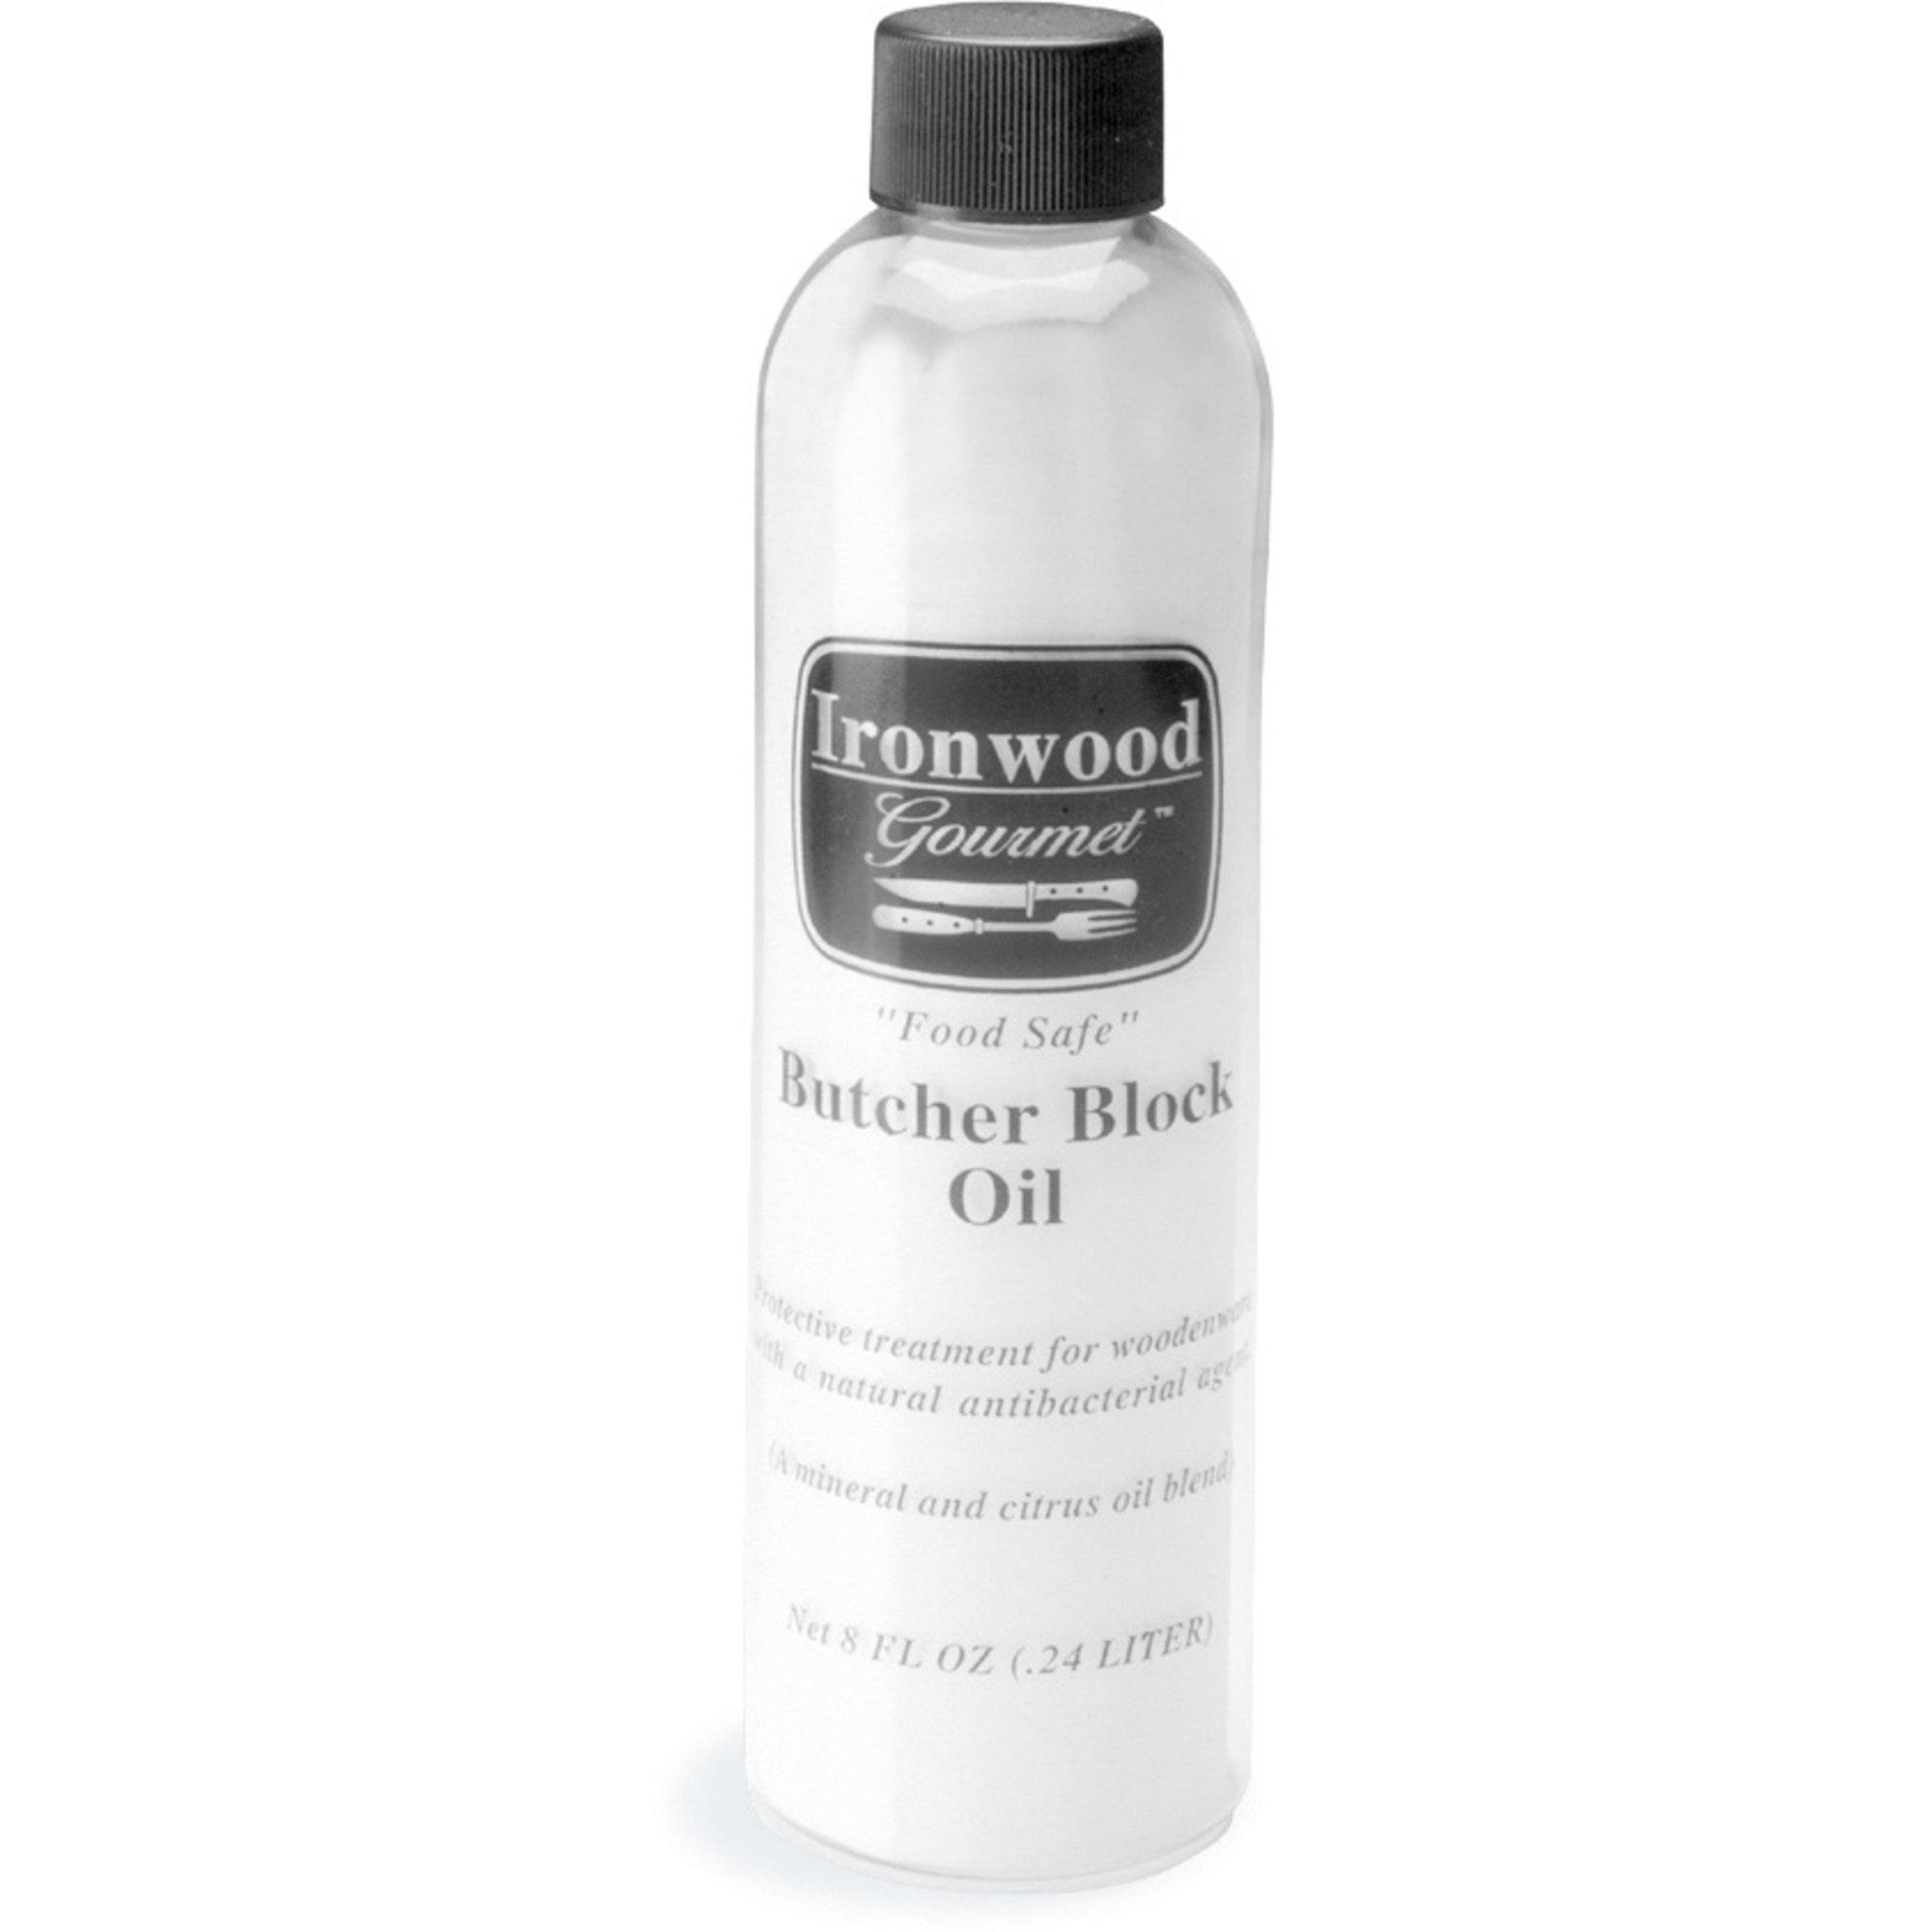 Ironwood Gourmet Butcher Block Oil